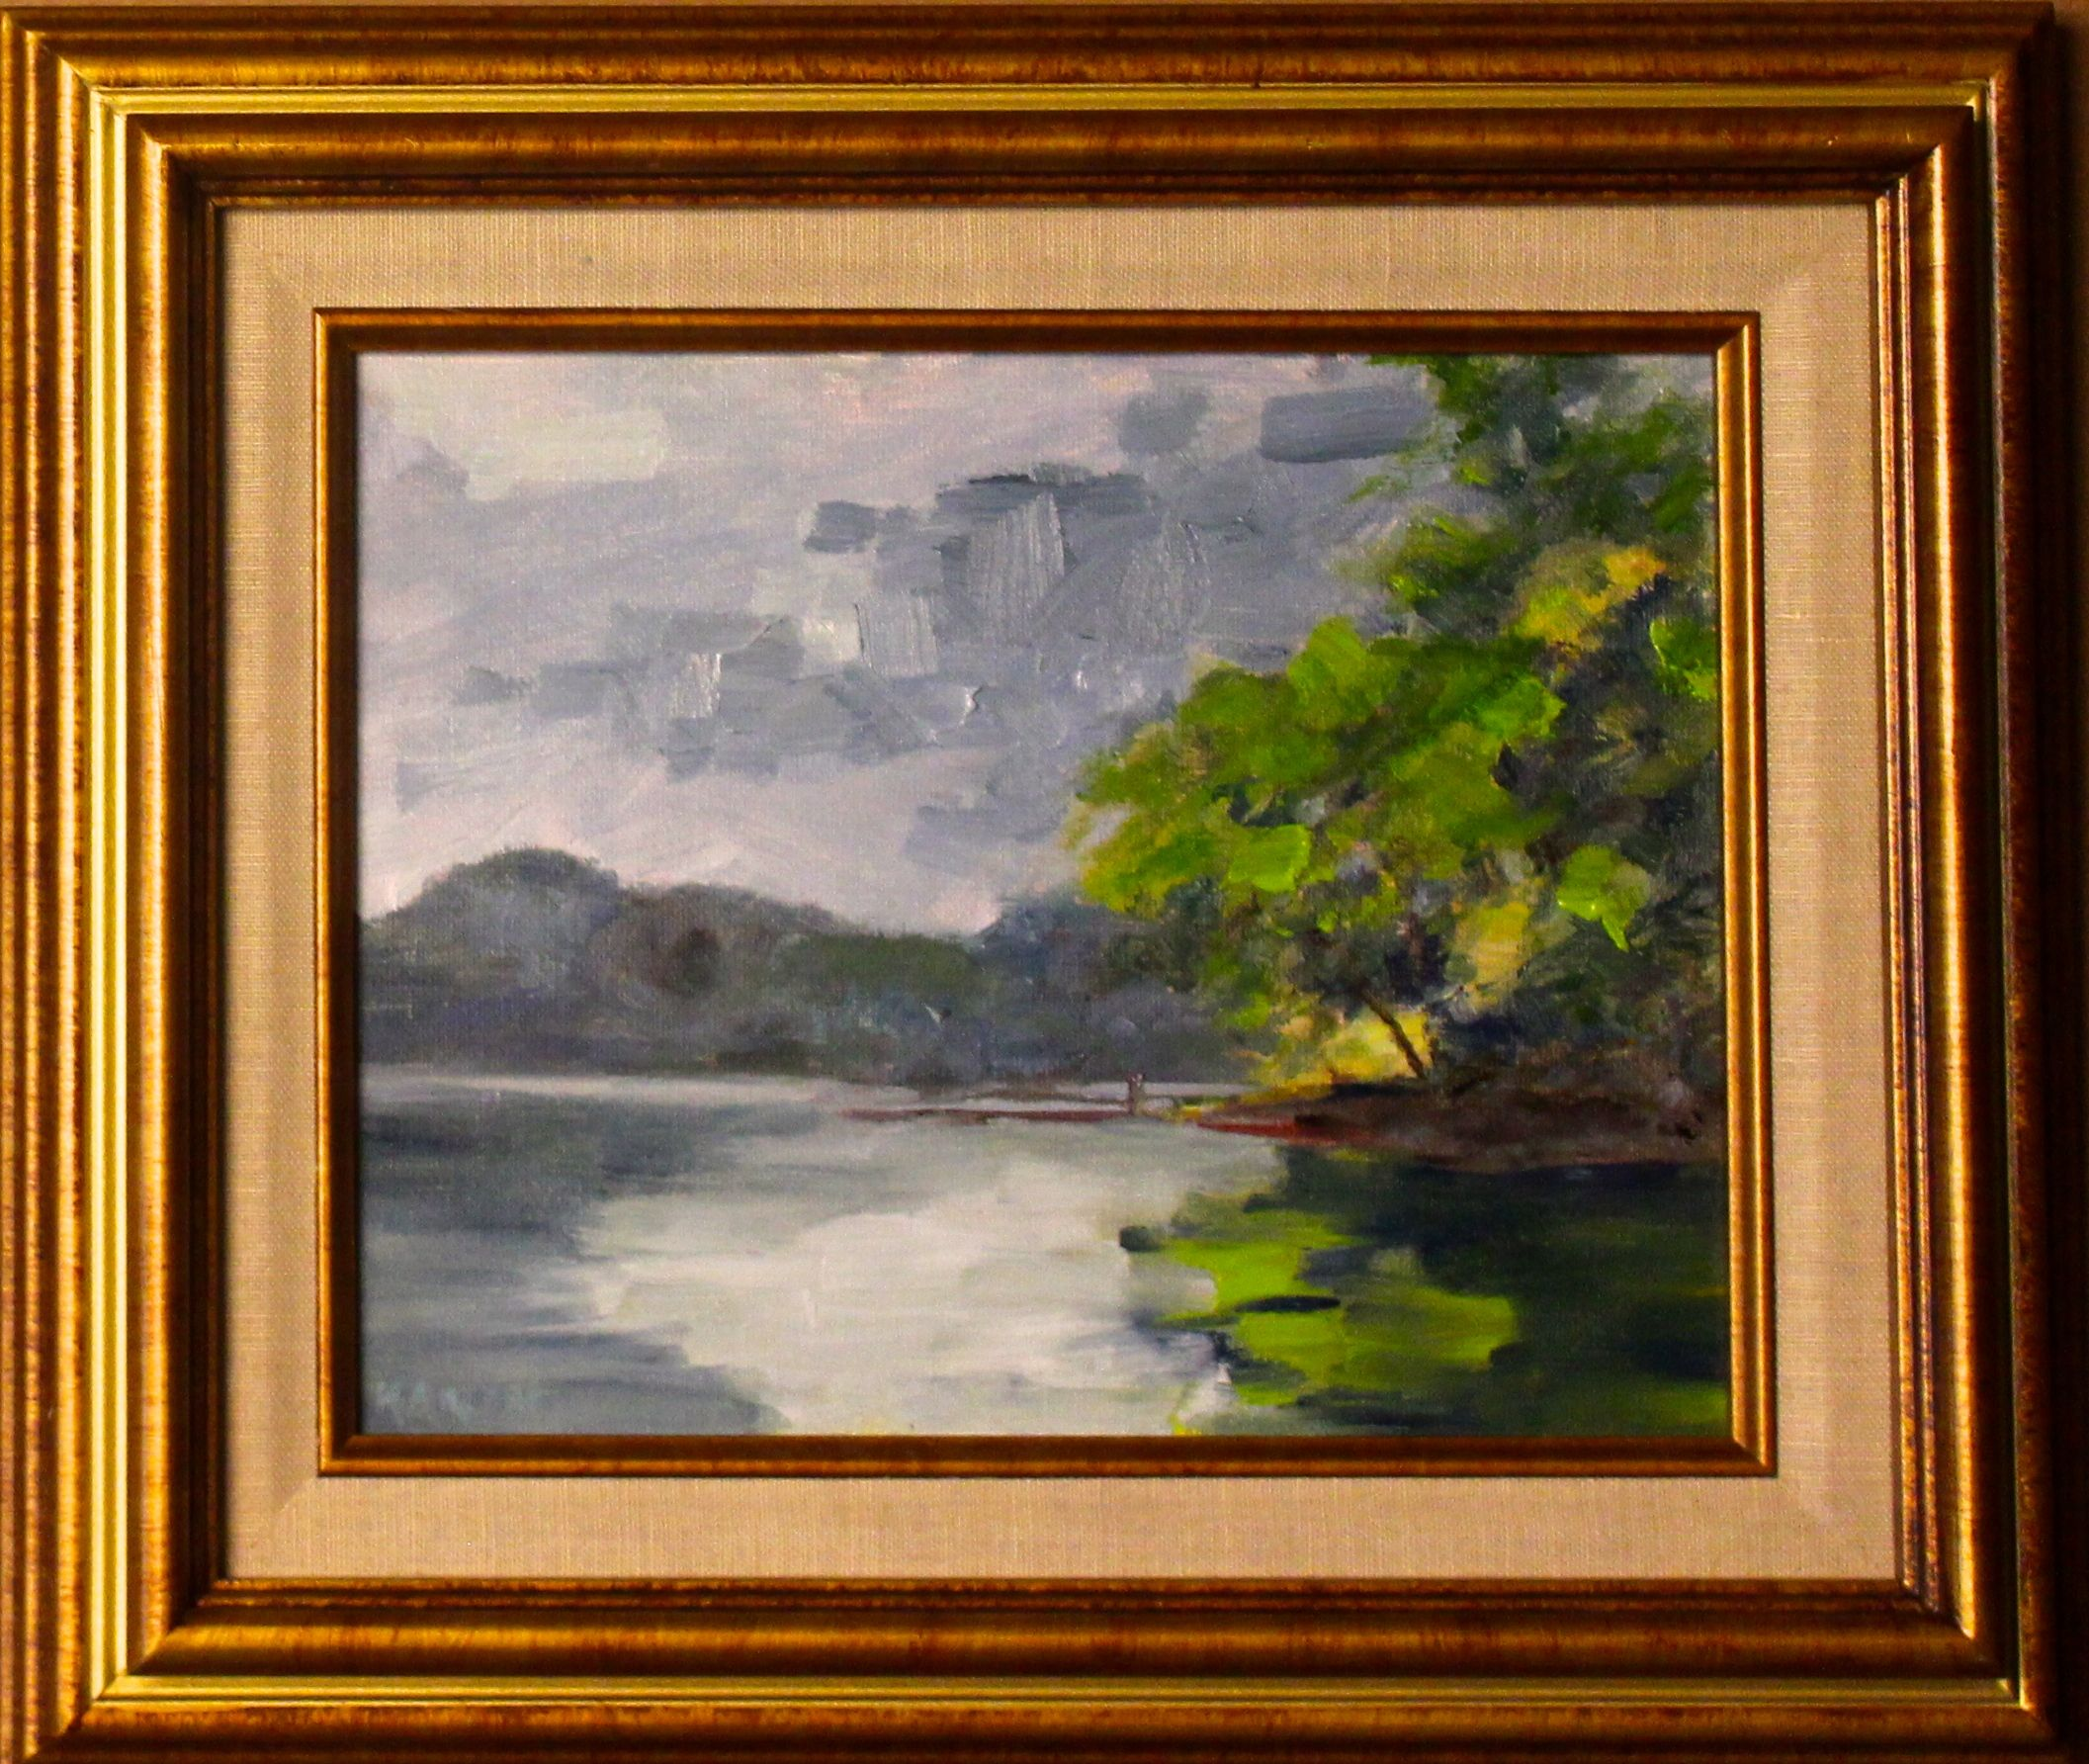 Plein Aire II Catawba River 8x10 oil on canvas board